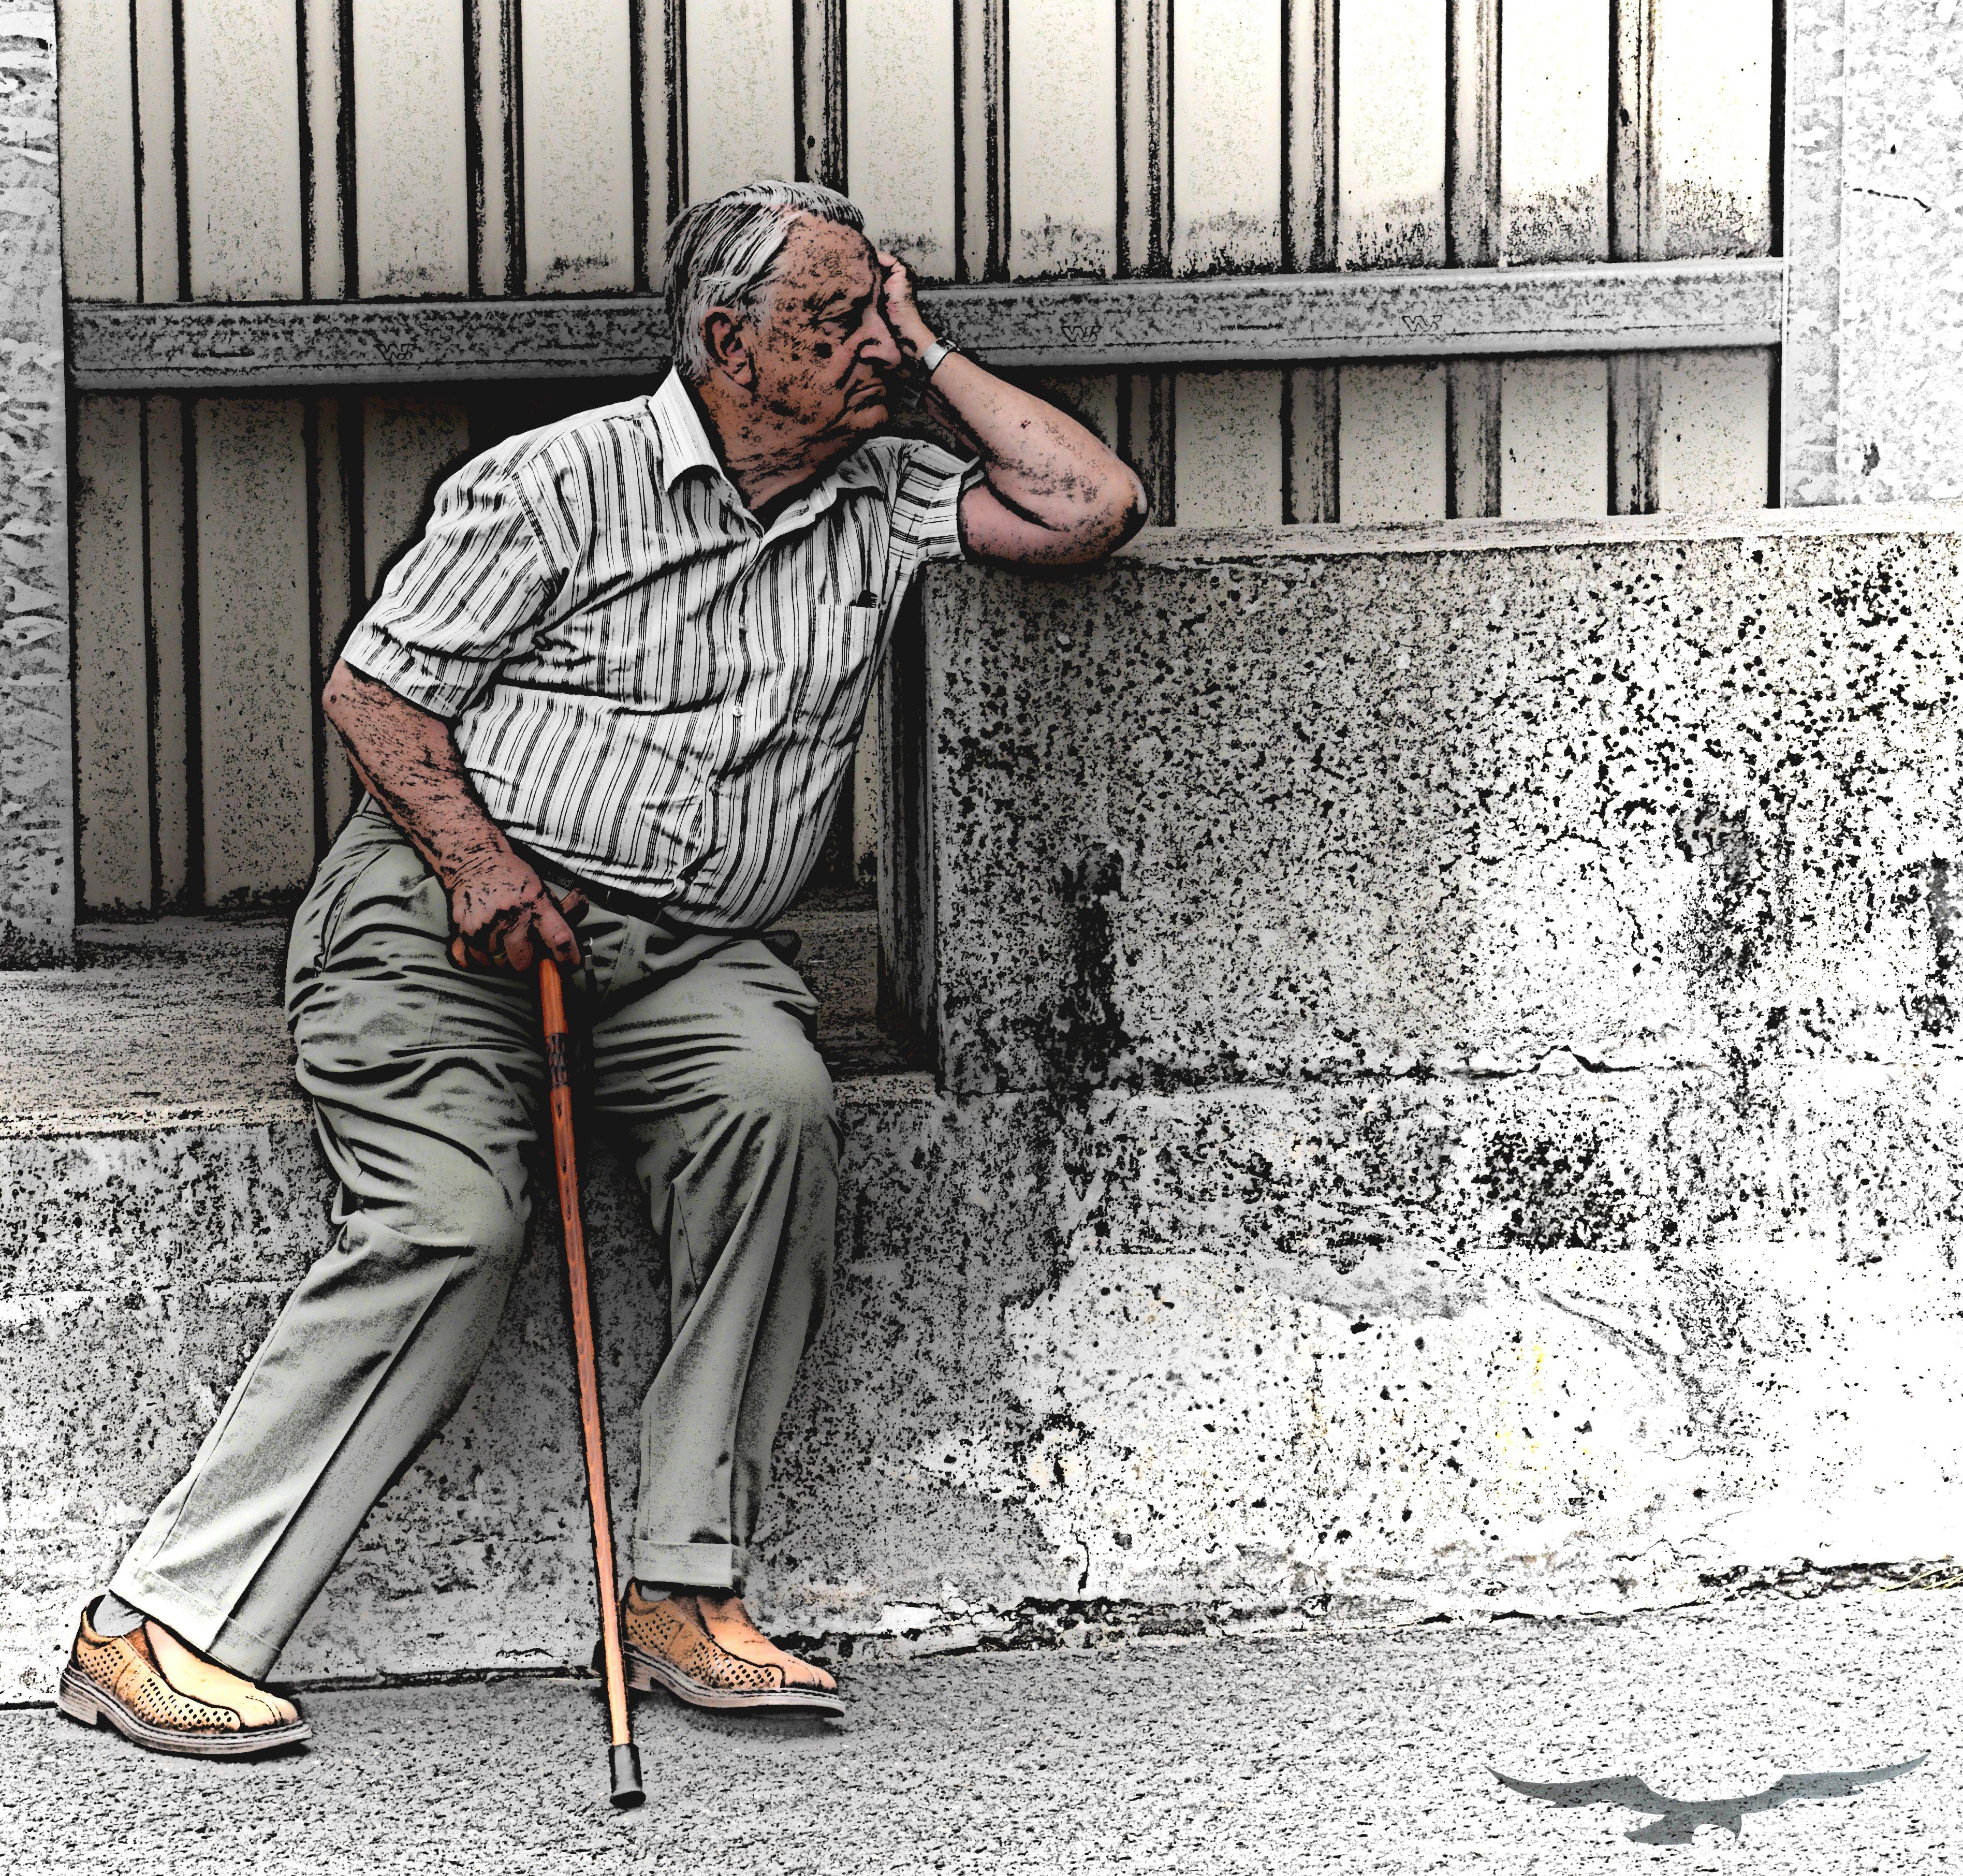 Trotz Rentenerhöhung – Altersarmut wächst lawinenhaft